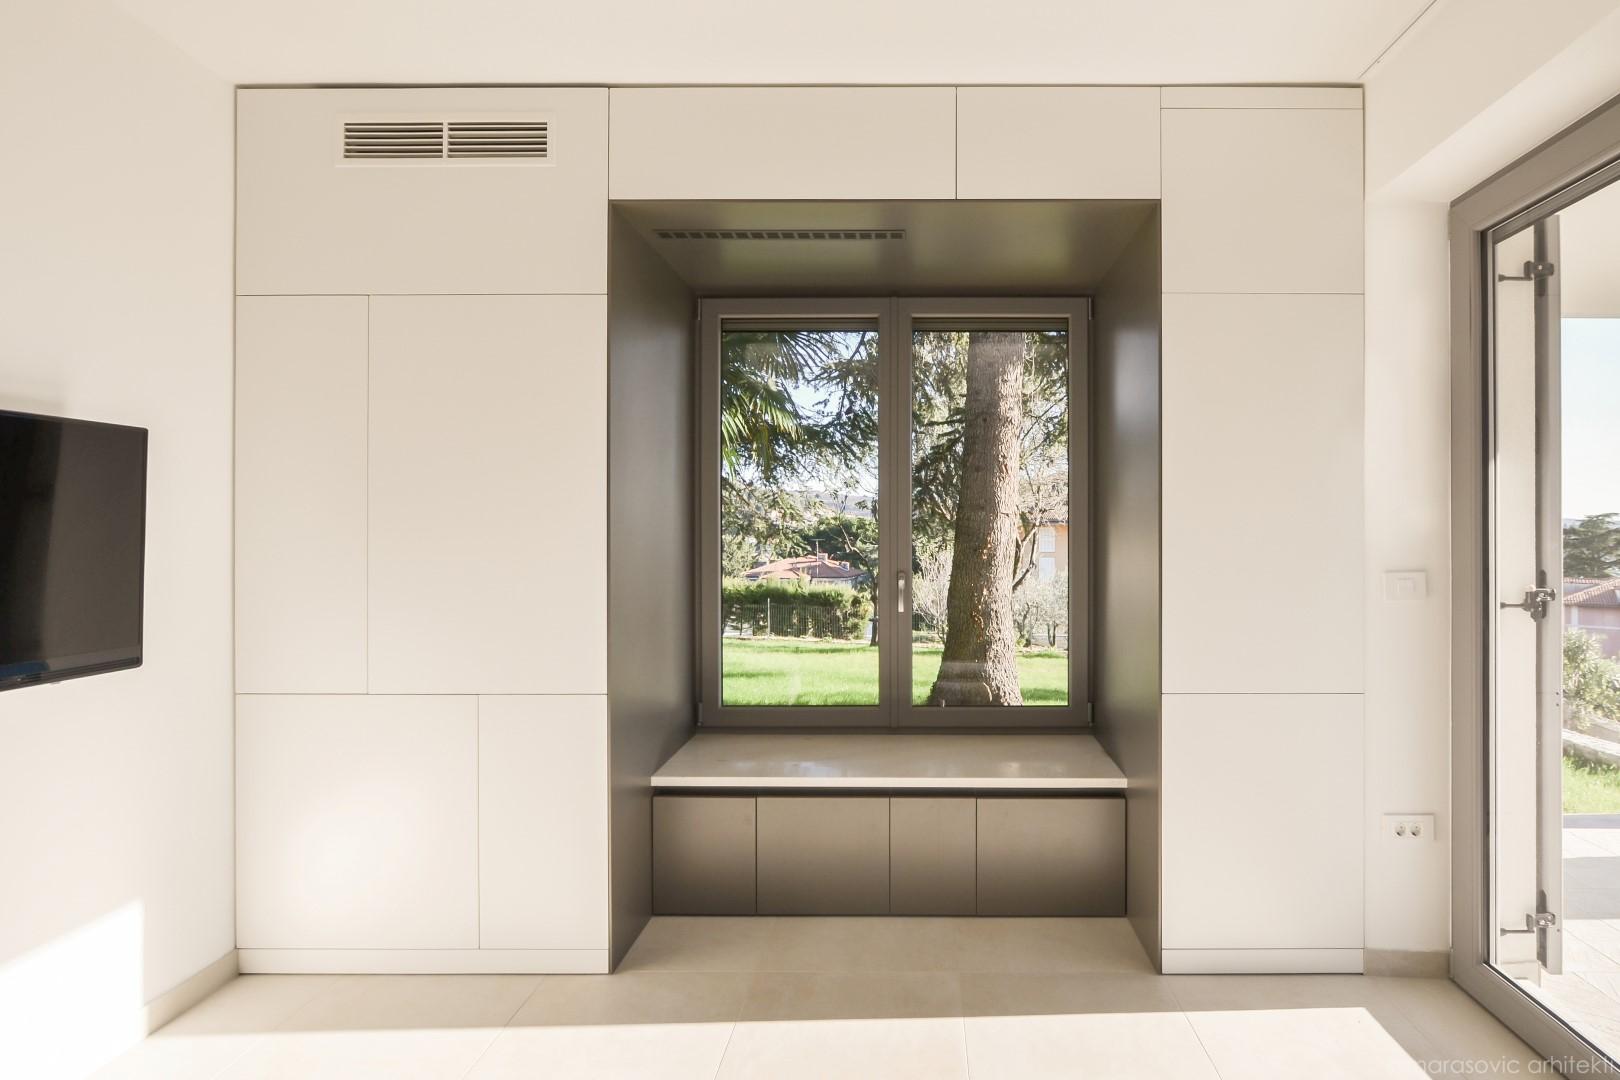 Vgradna omara za stanovanje